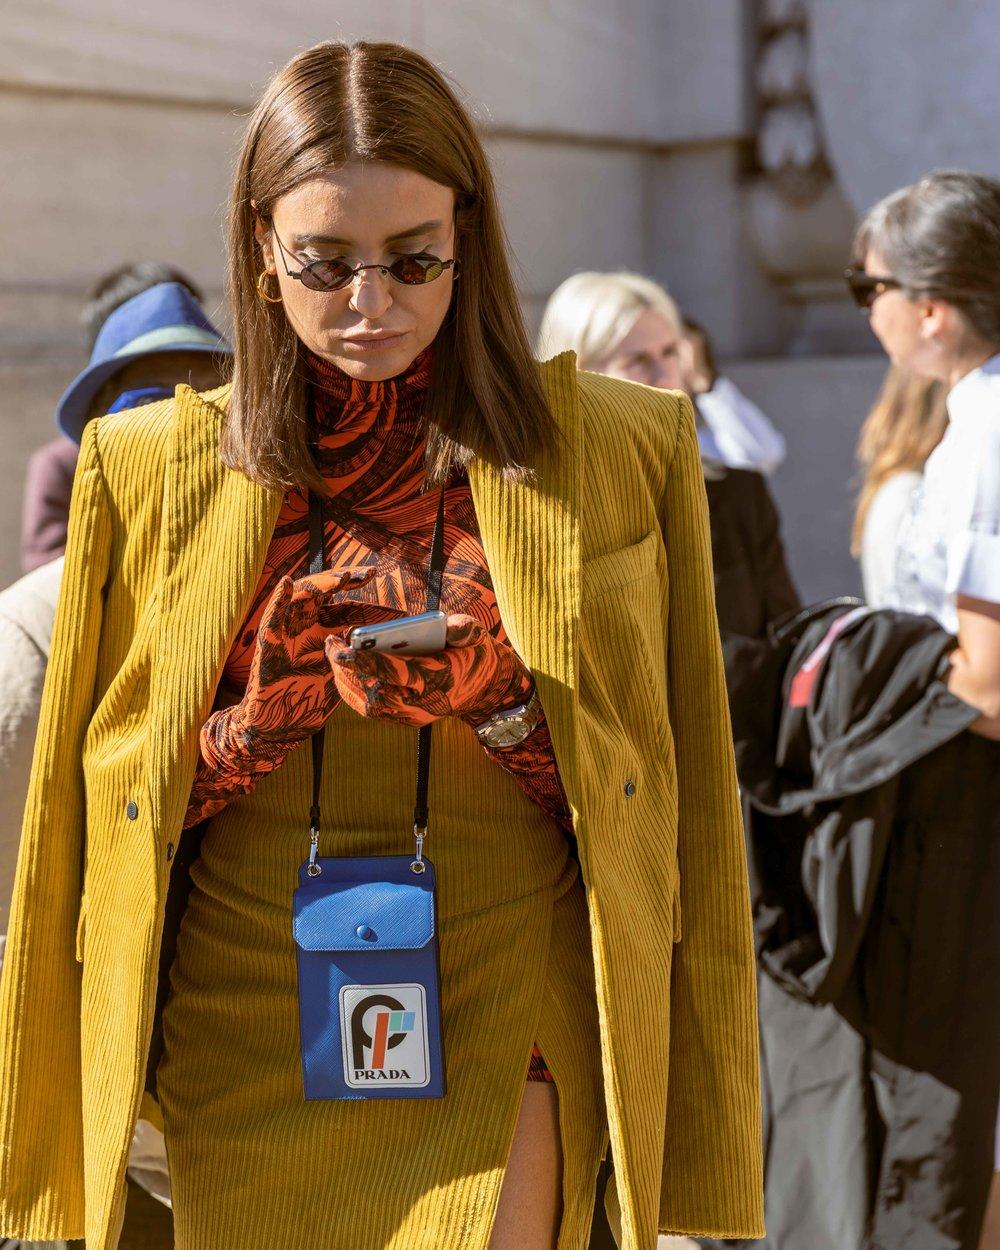 Paris-Fashion-Week-Spring-2019-September-2018_by_Alexis_Breugelmans_005.jpg